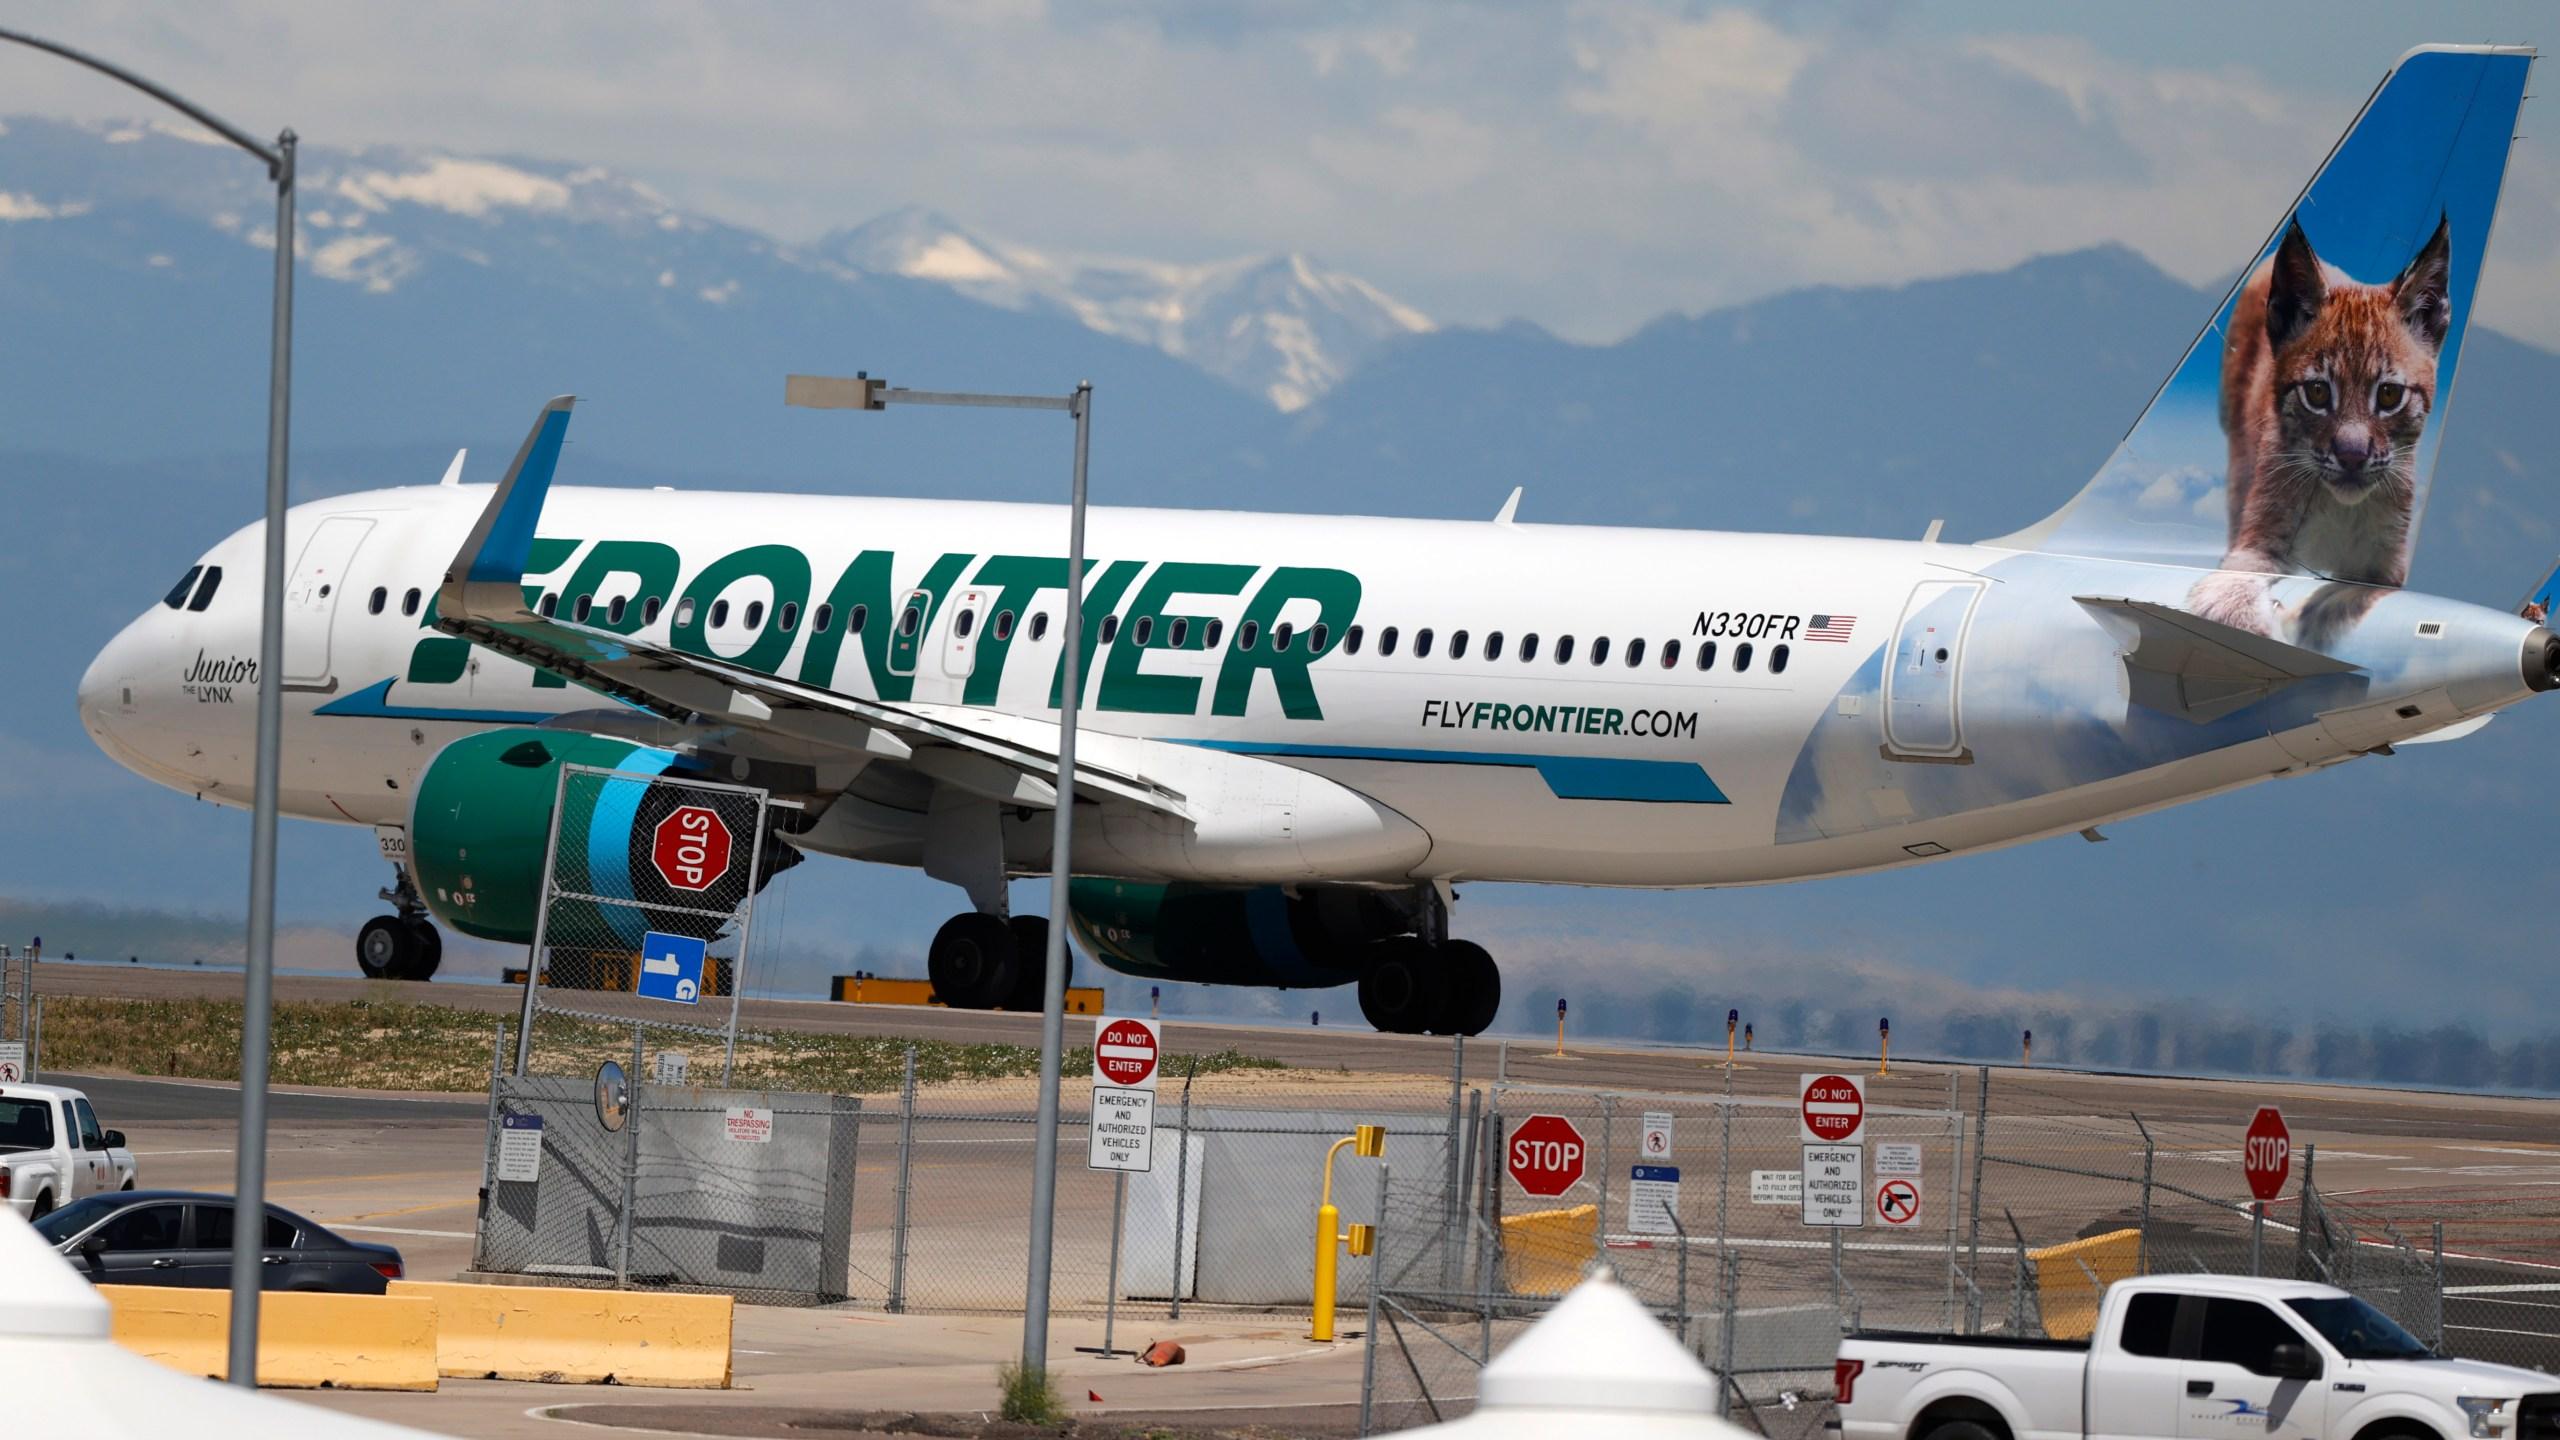 frontier airlines, denver international airport, r m